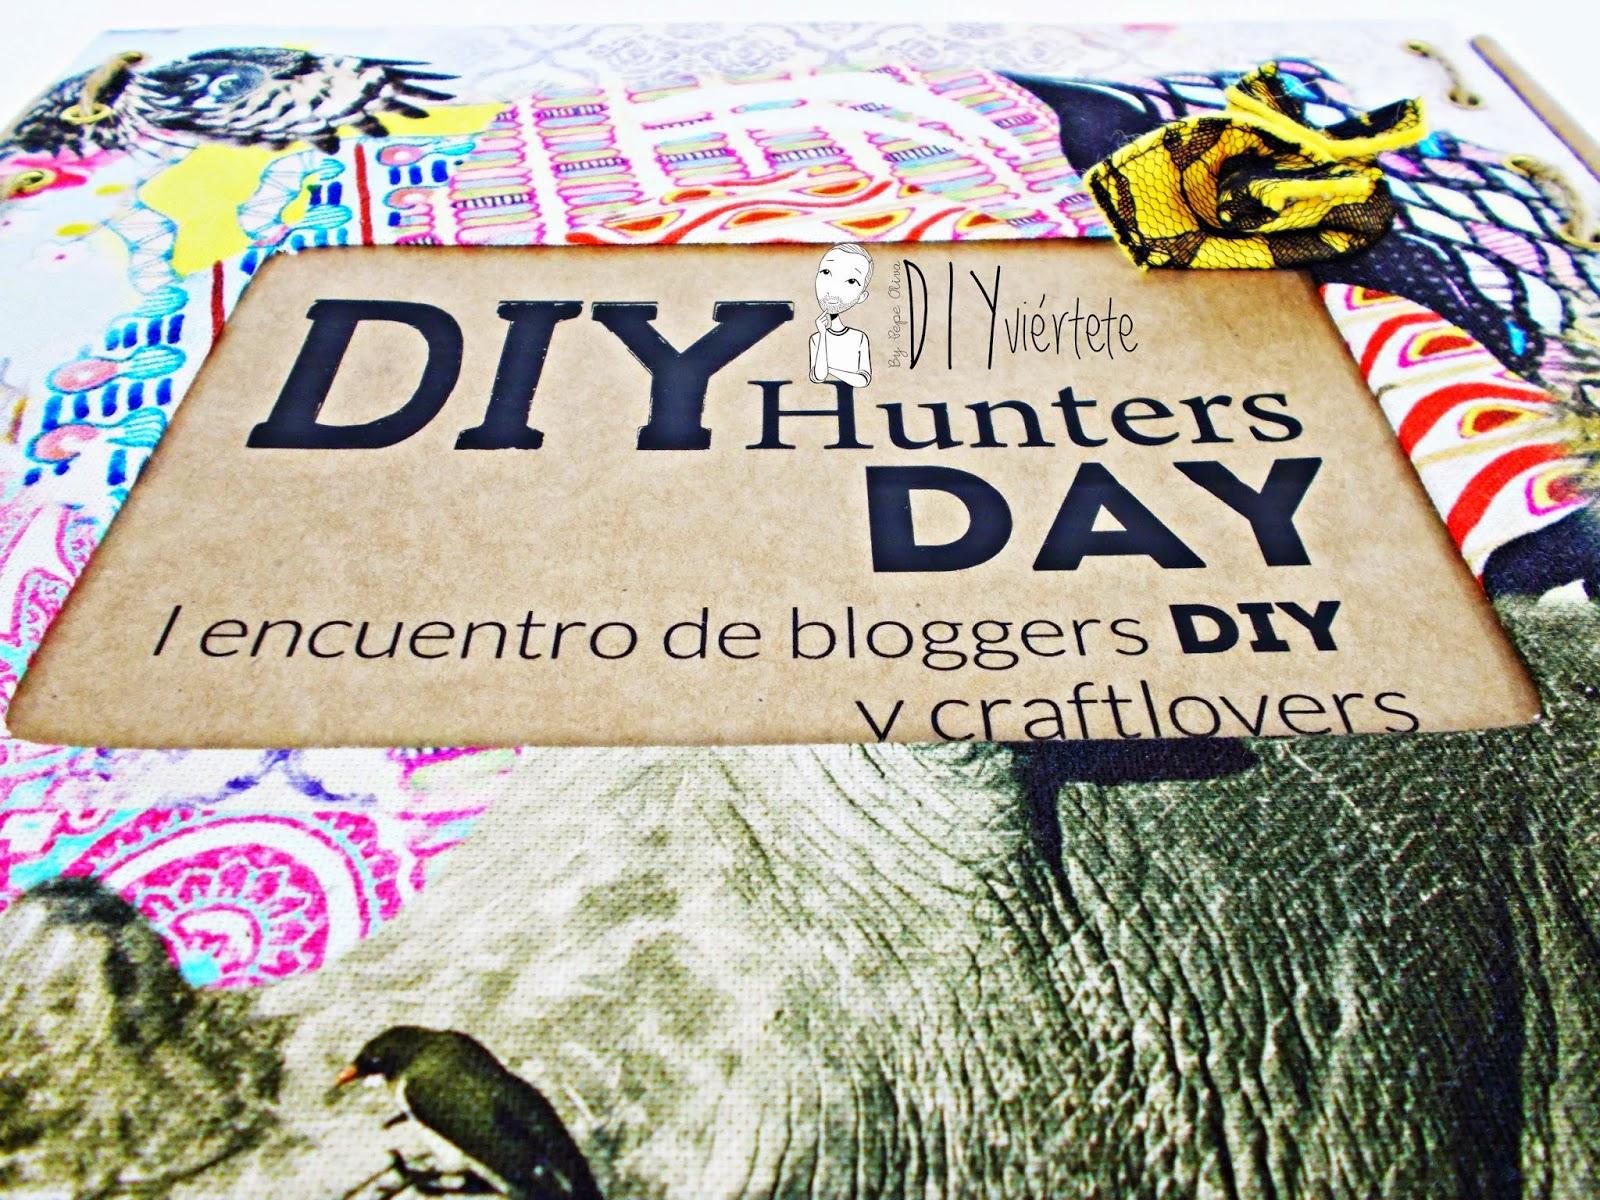 DIY-Do It Yourself-caja-cartón-selfpackaging-customizar-handbox-yodona-diyhuntersday-craftlovers-99